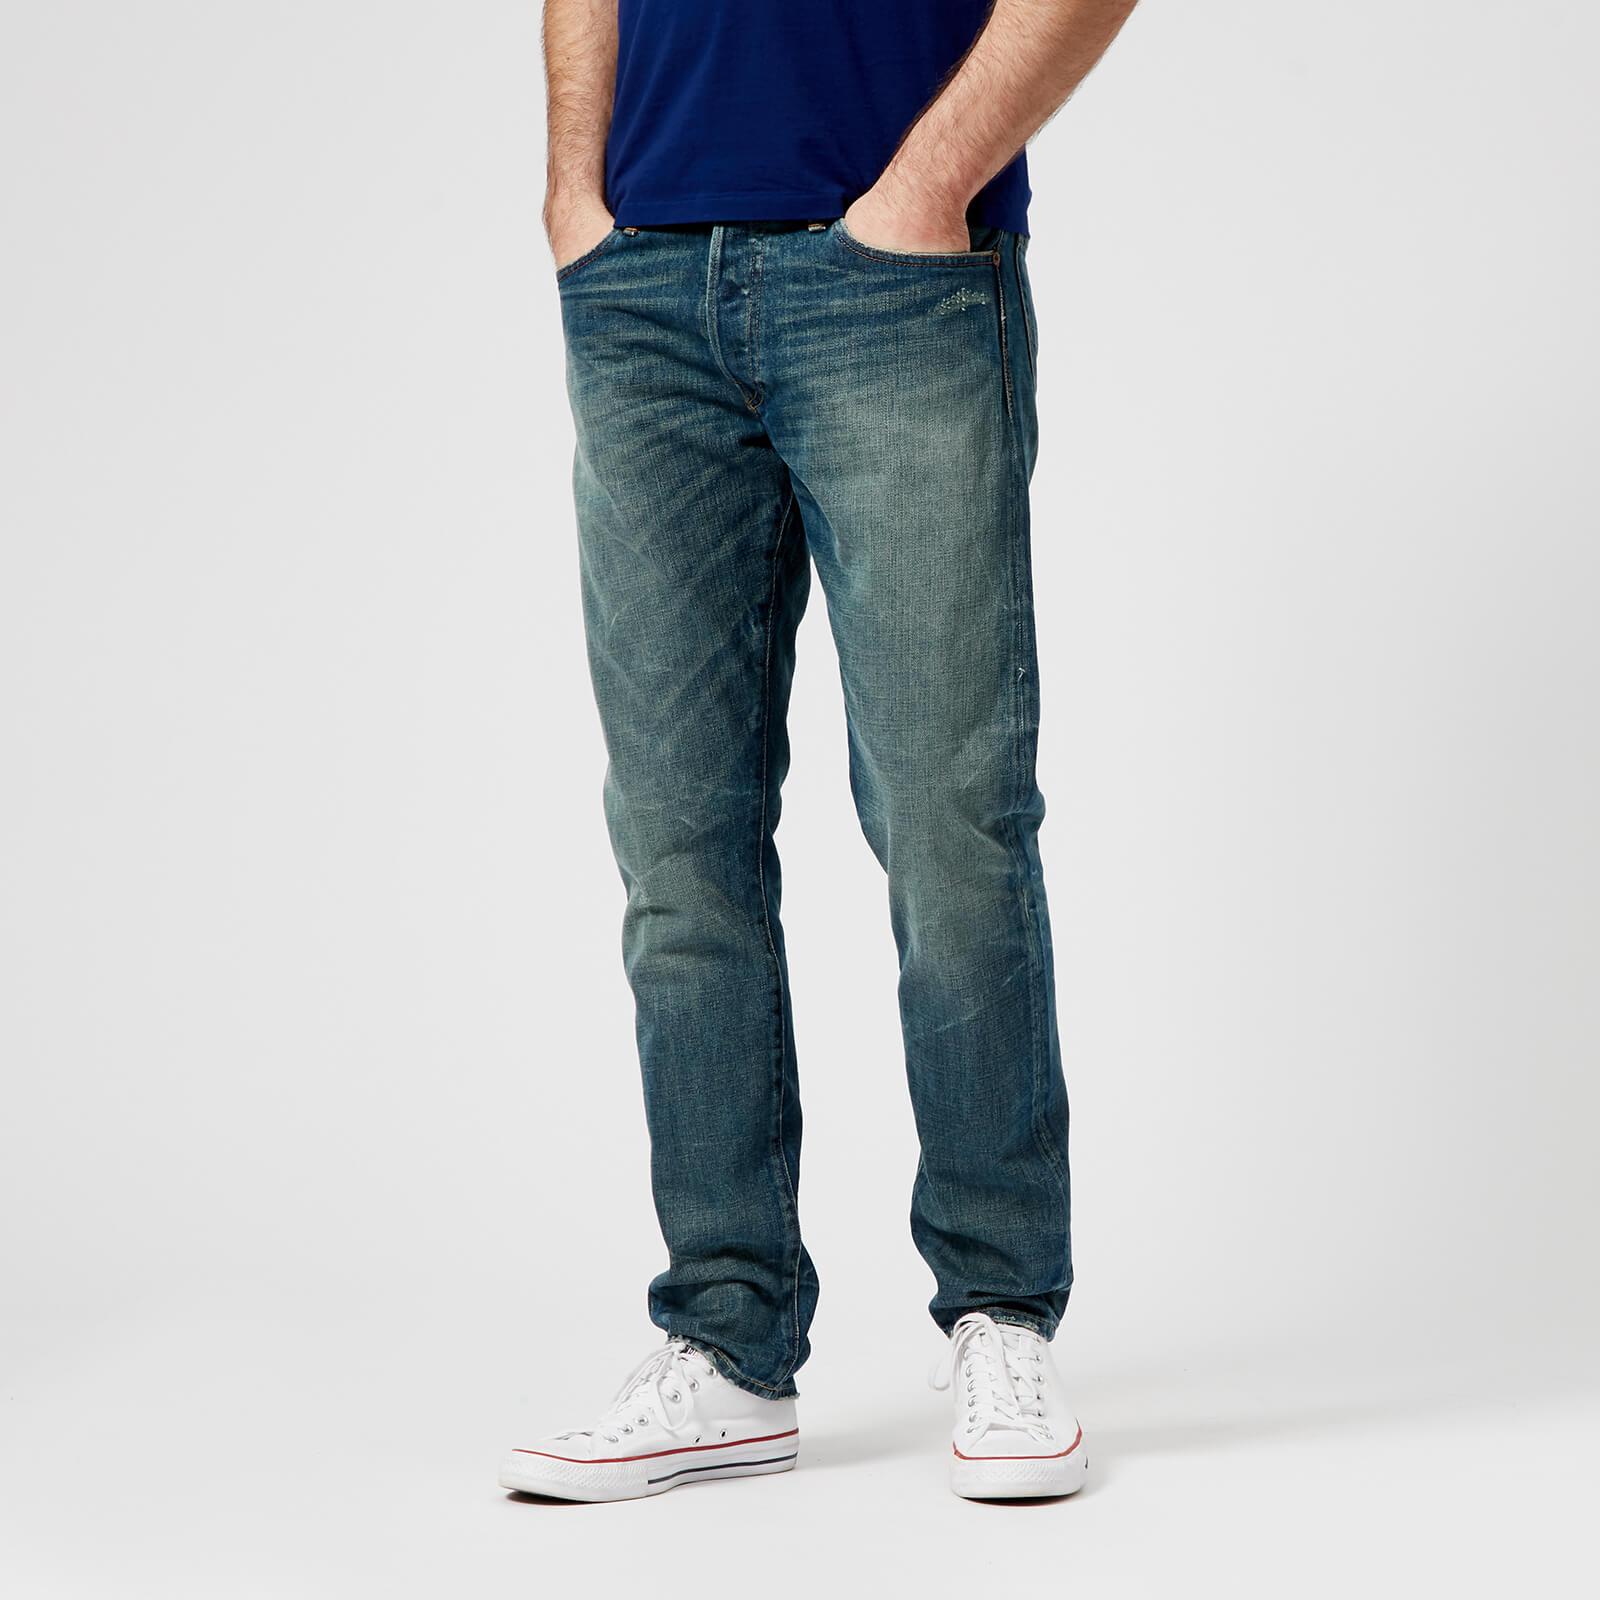 6ce15fb6e3cd Polo Ralph Lauren Men s Sullivan 5 Pocket Slim Denim Jeans - Traverse Wash  - Free UK Delivery over £50